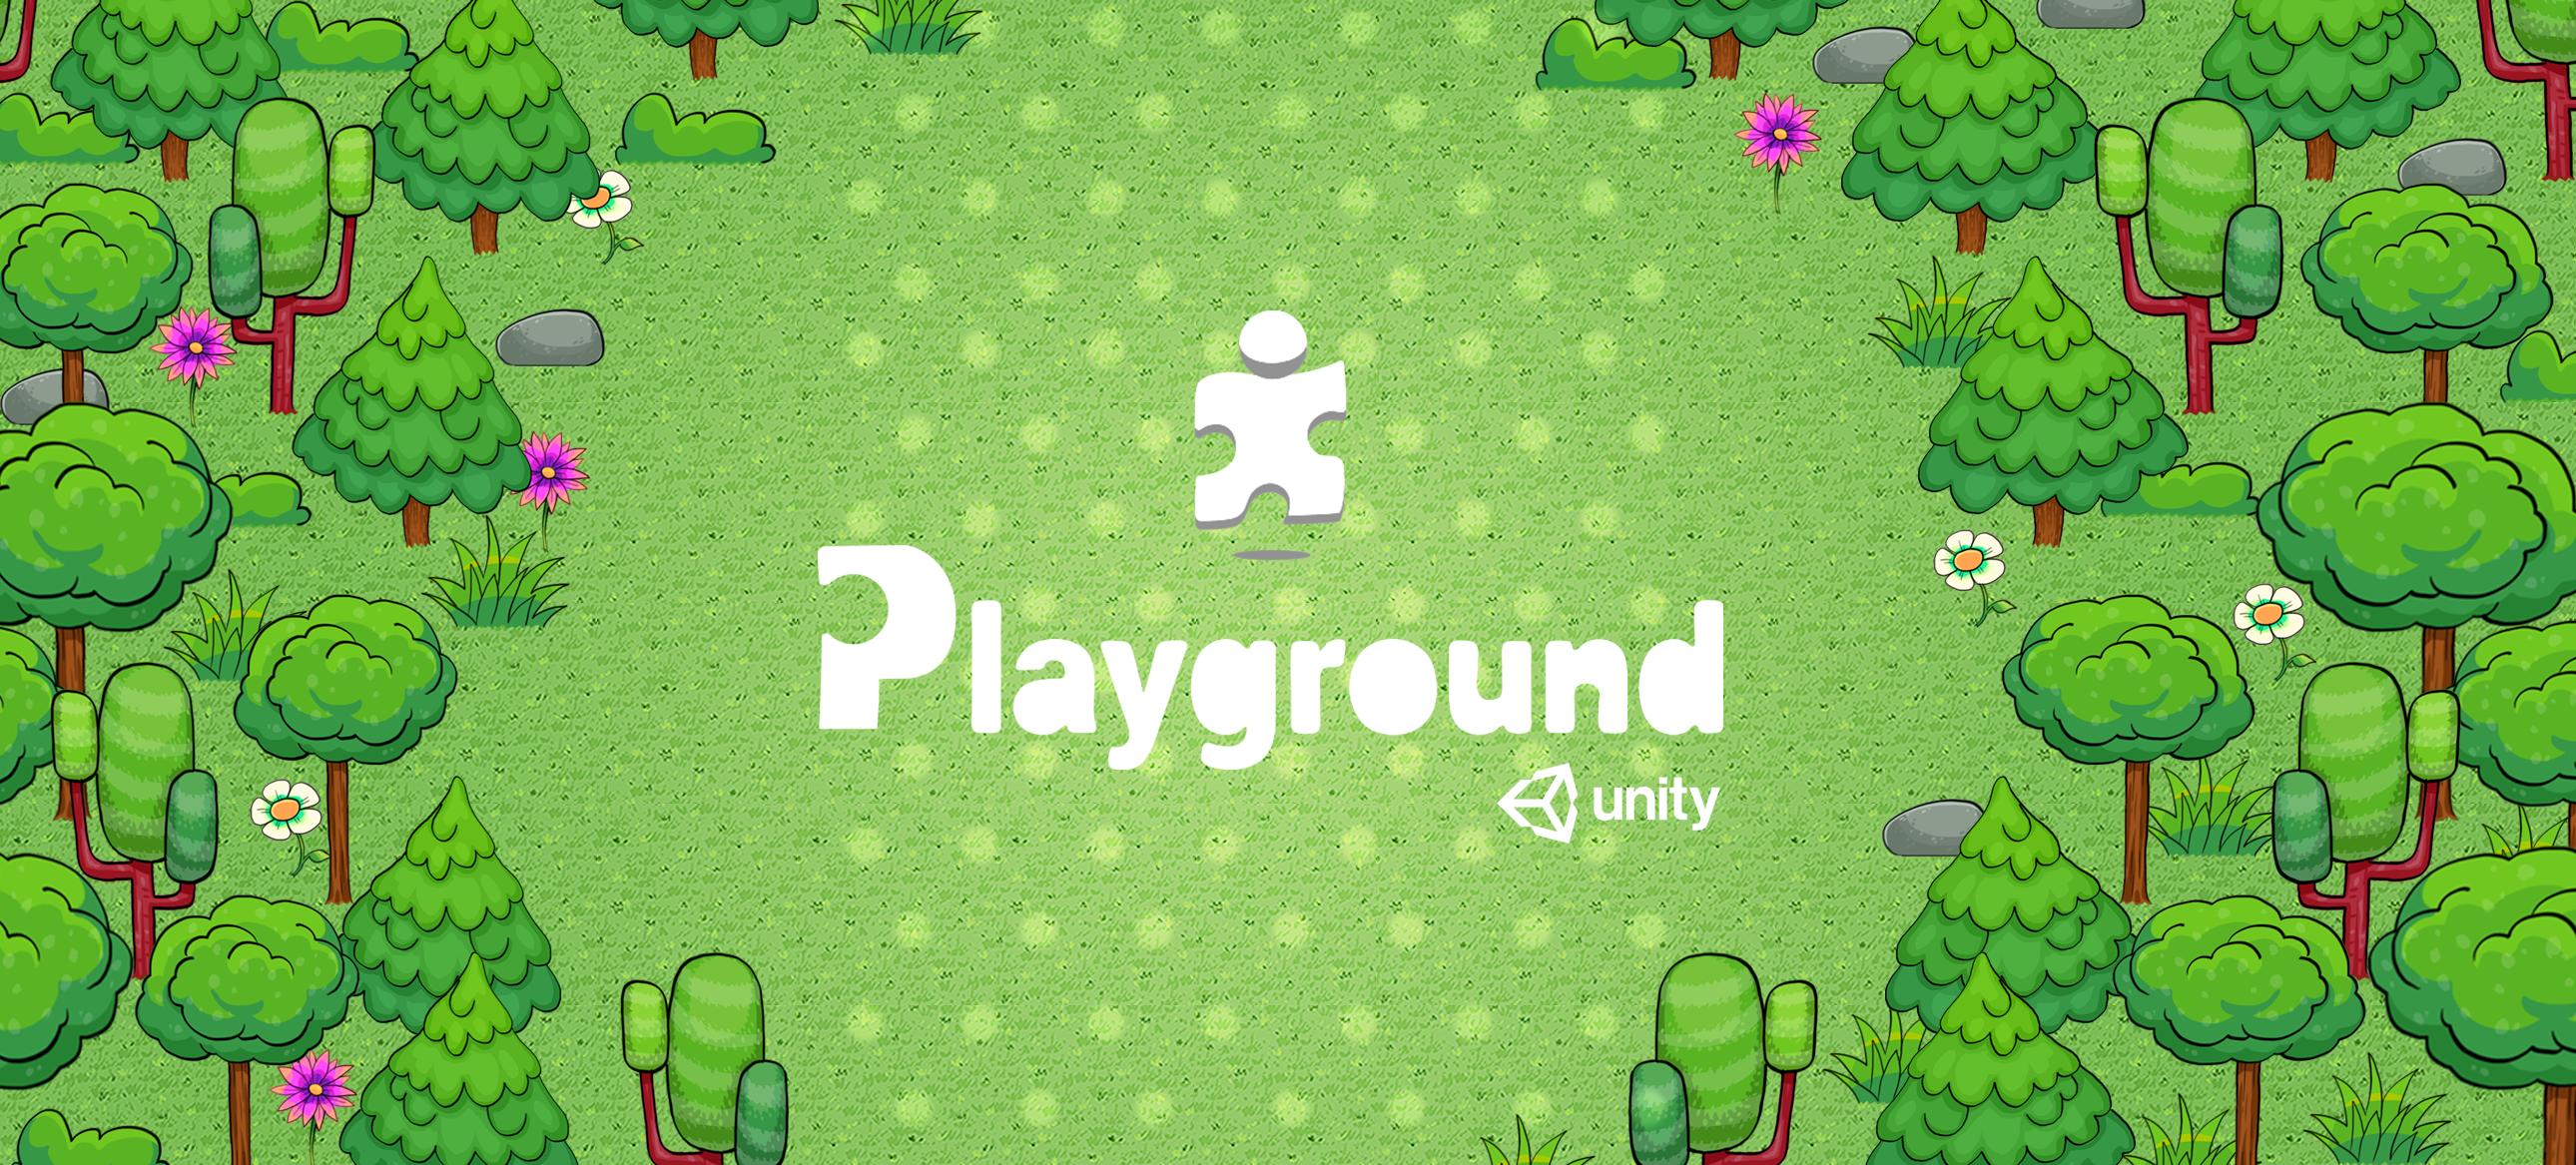 Unity Playground